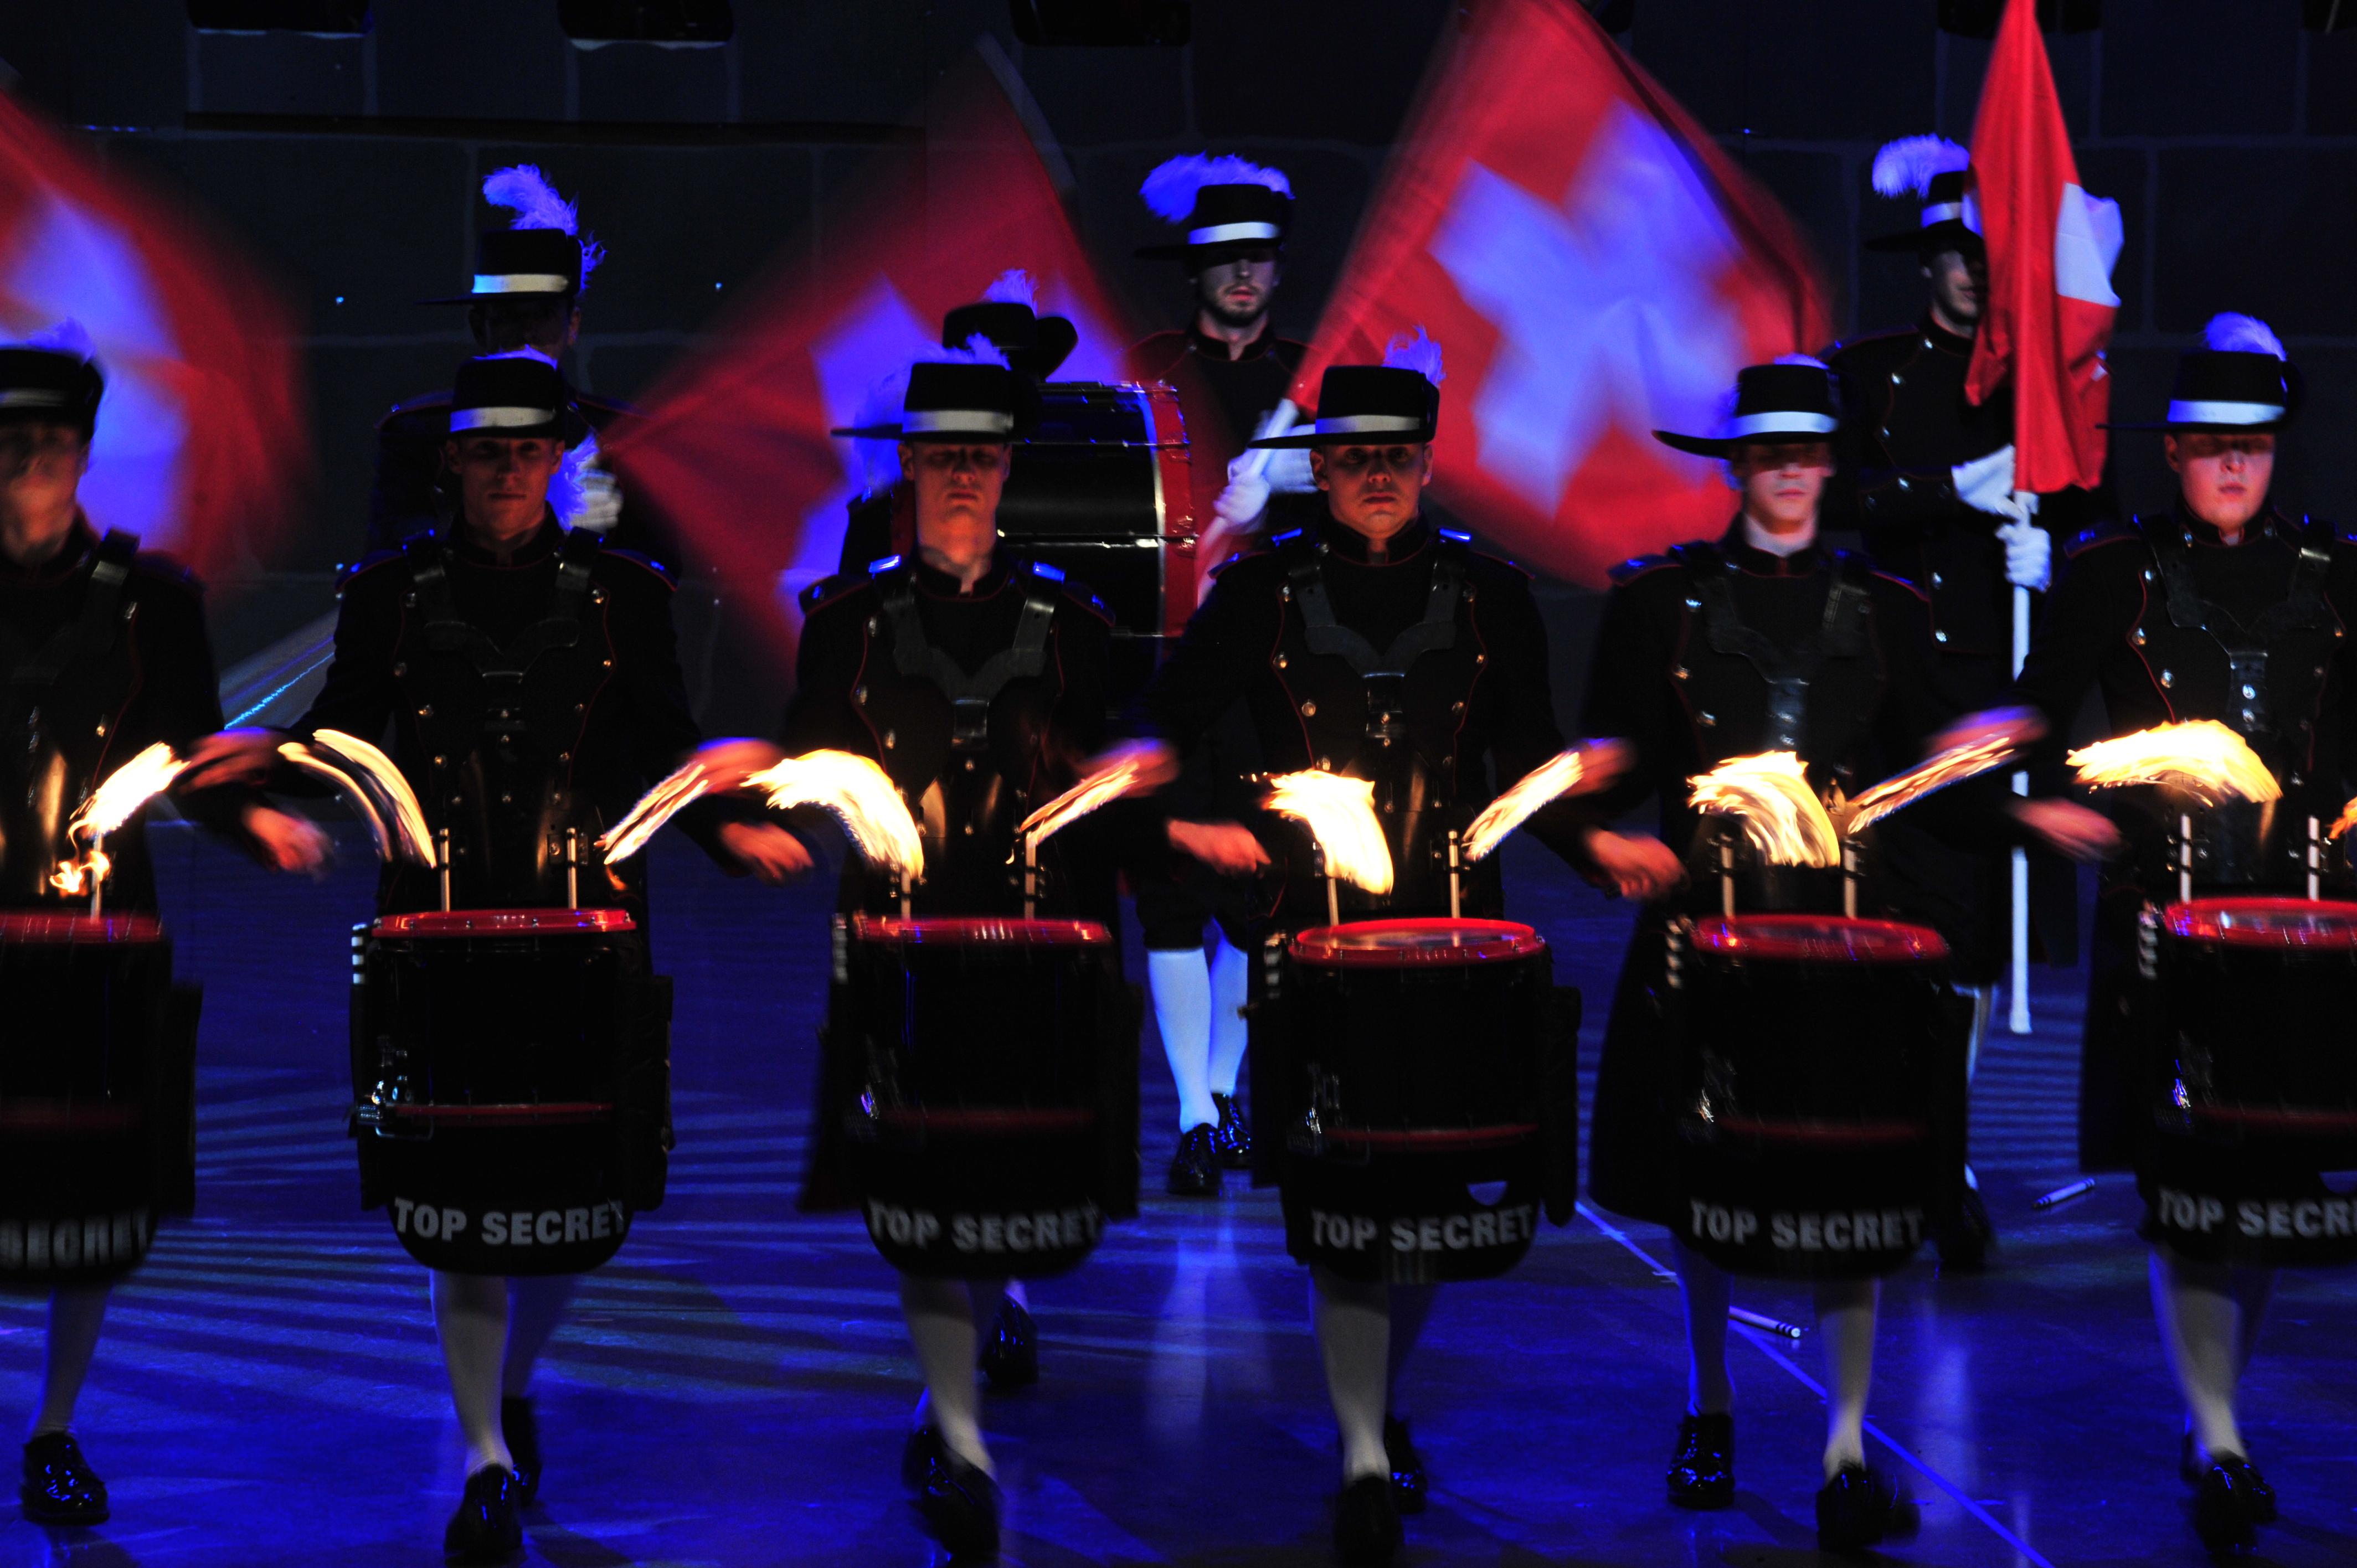 Top Secret Drum Corps Wikipedia